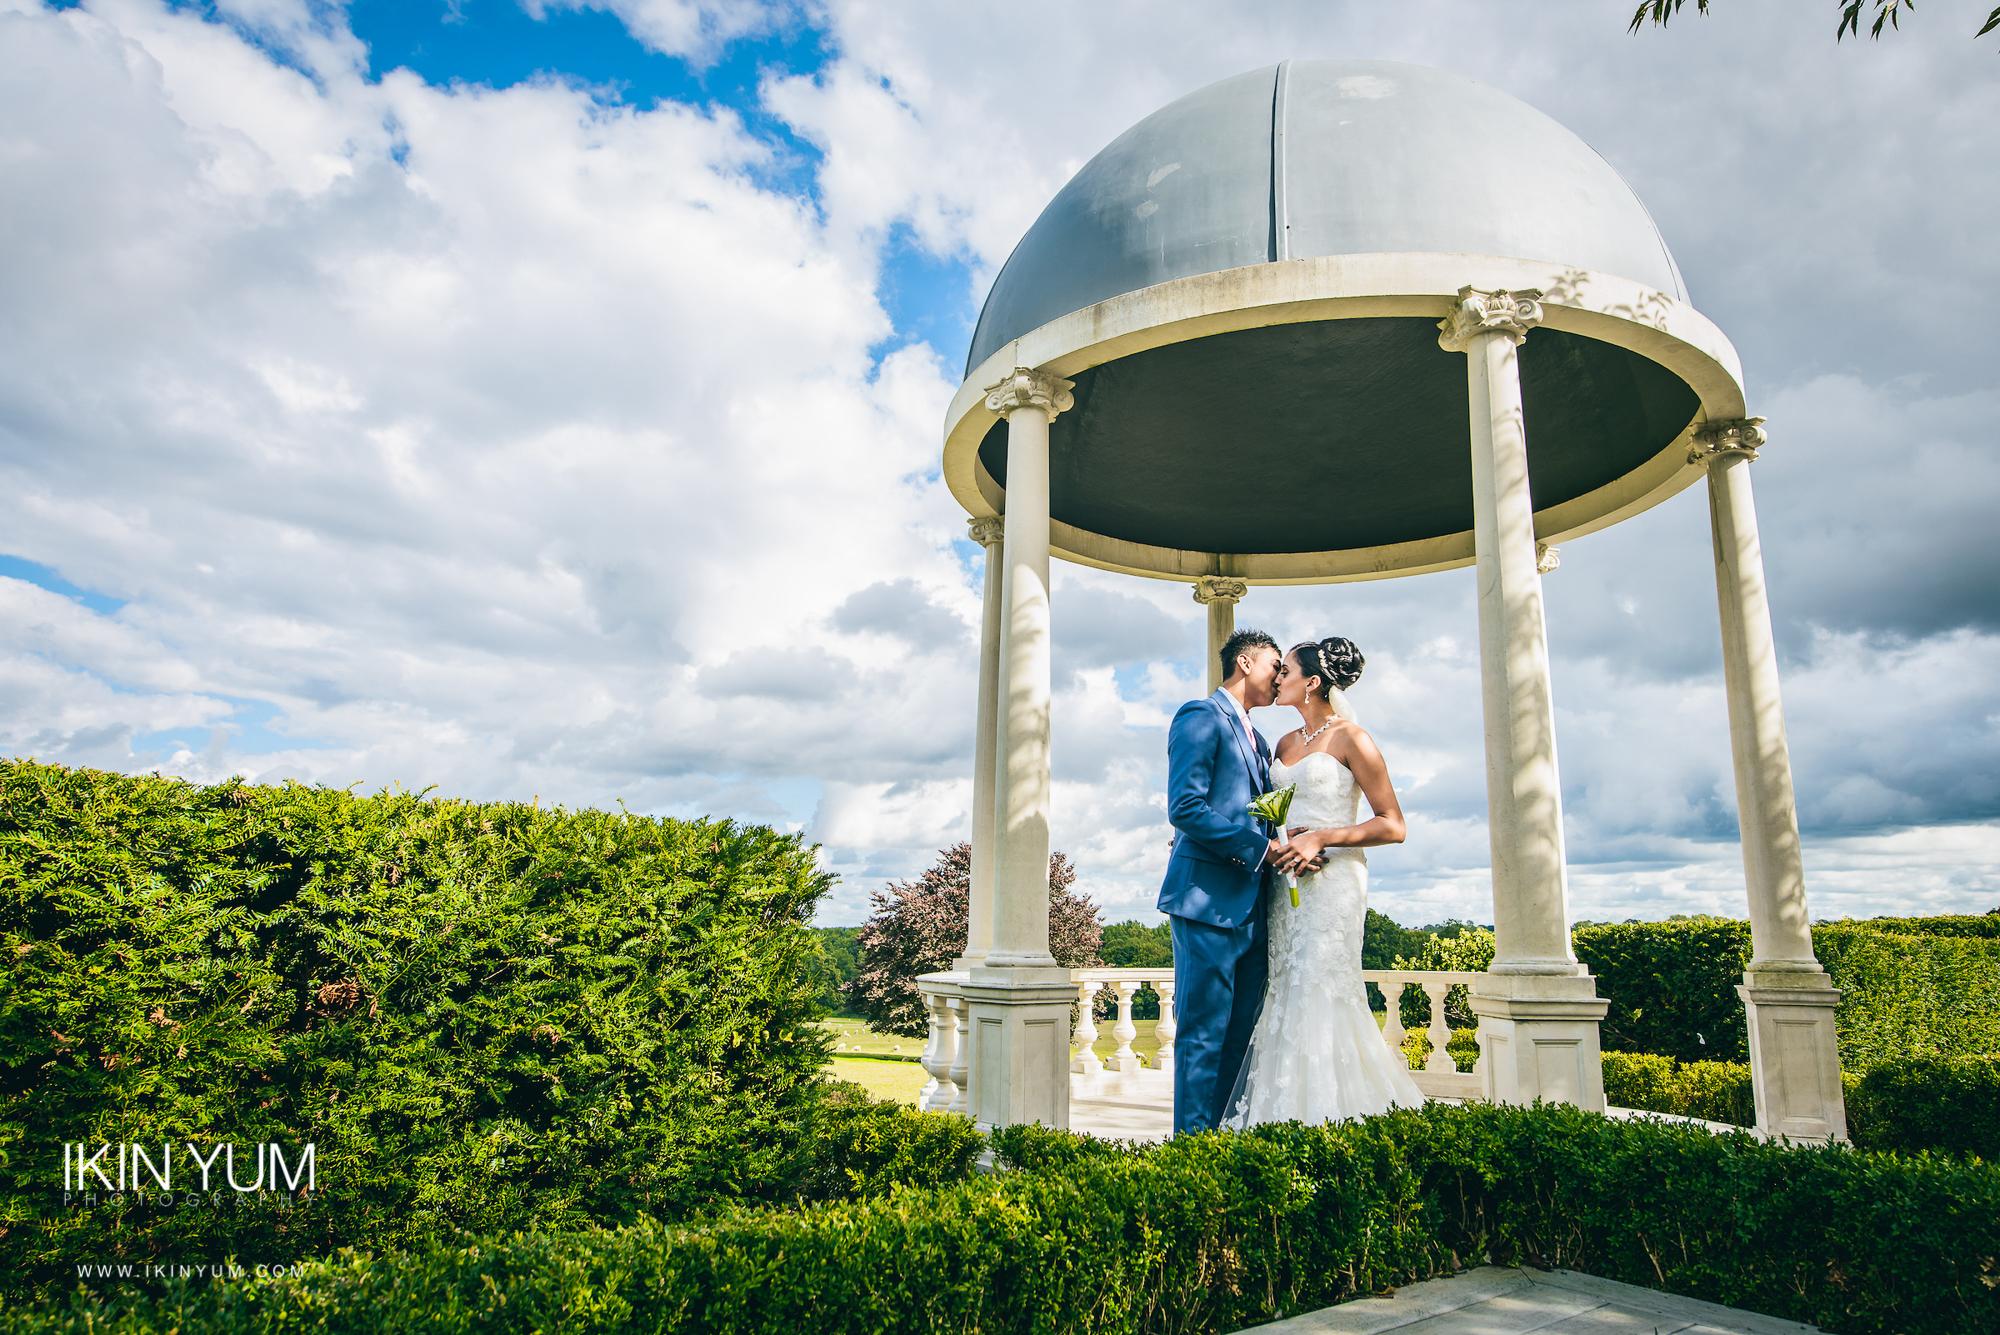 Froyle Park Wedding - London Asian Wedding Photographer